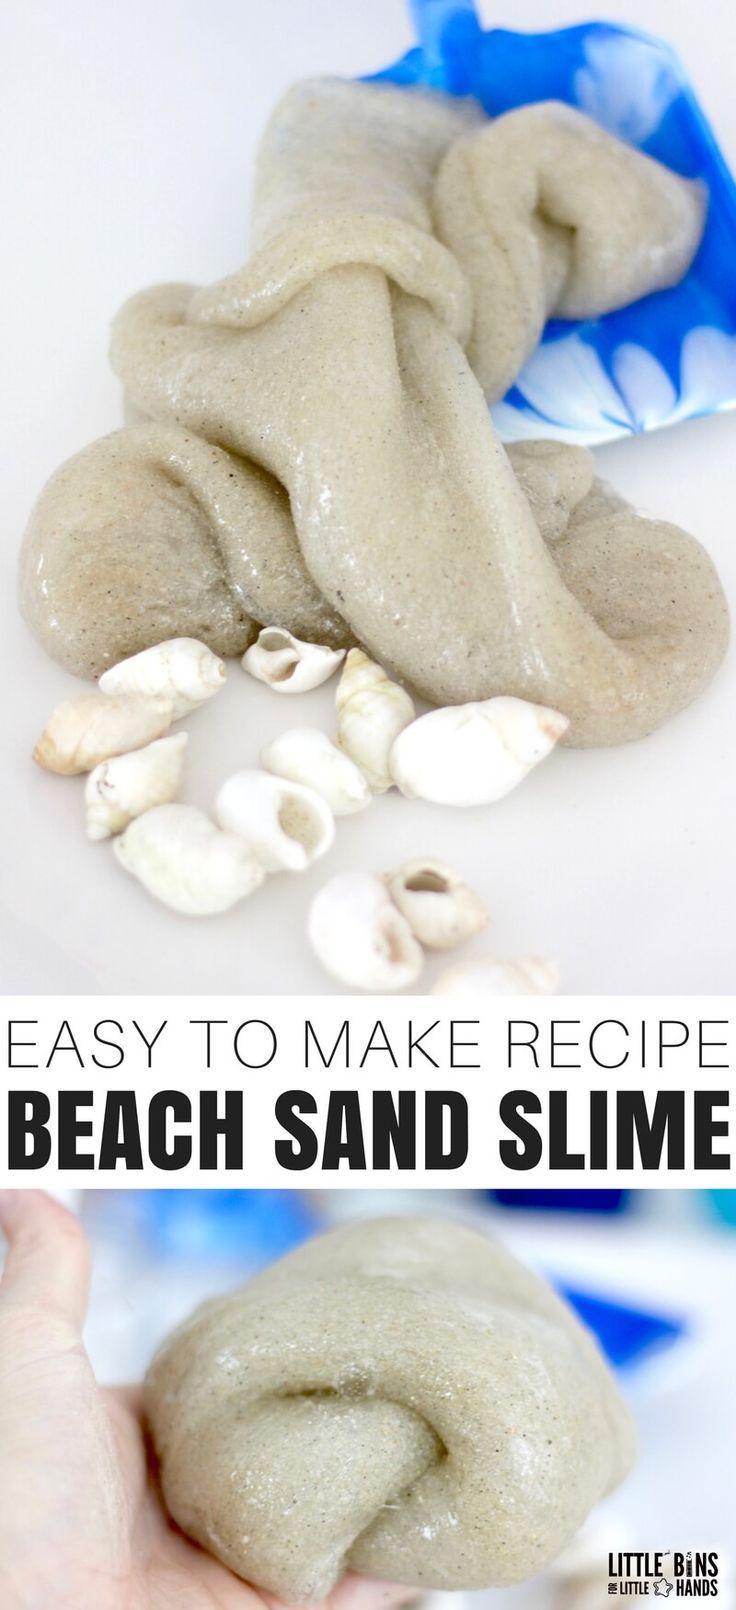 1535 best homemade Doughs, slimes, goops, foams, images on Pinterest ...